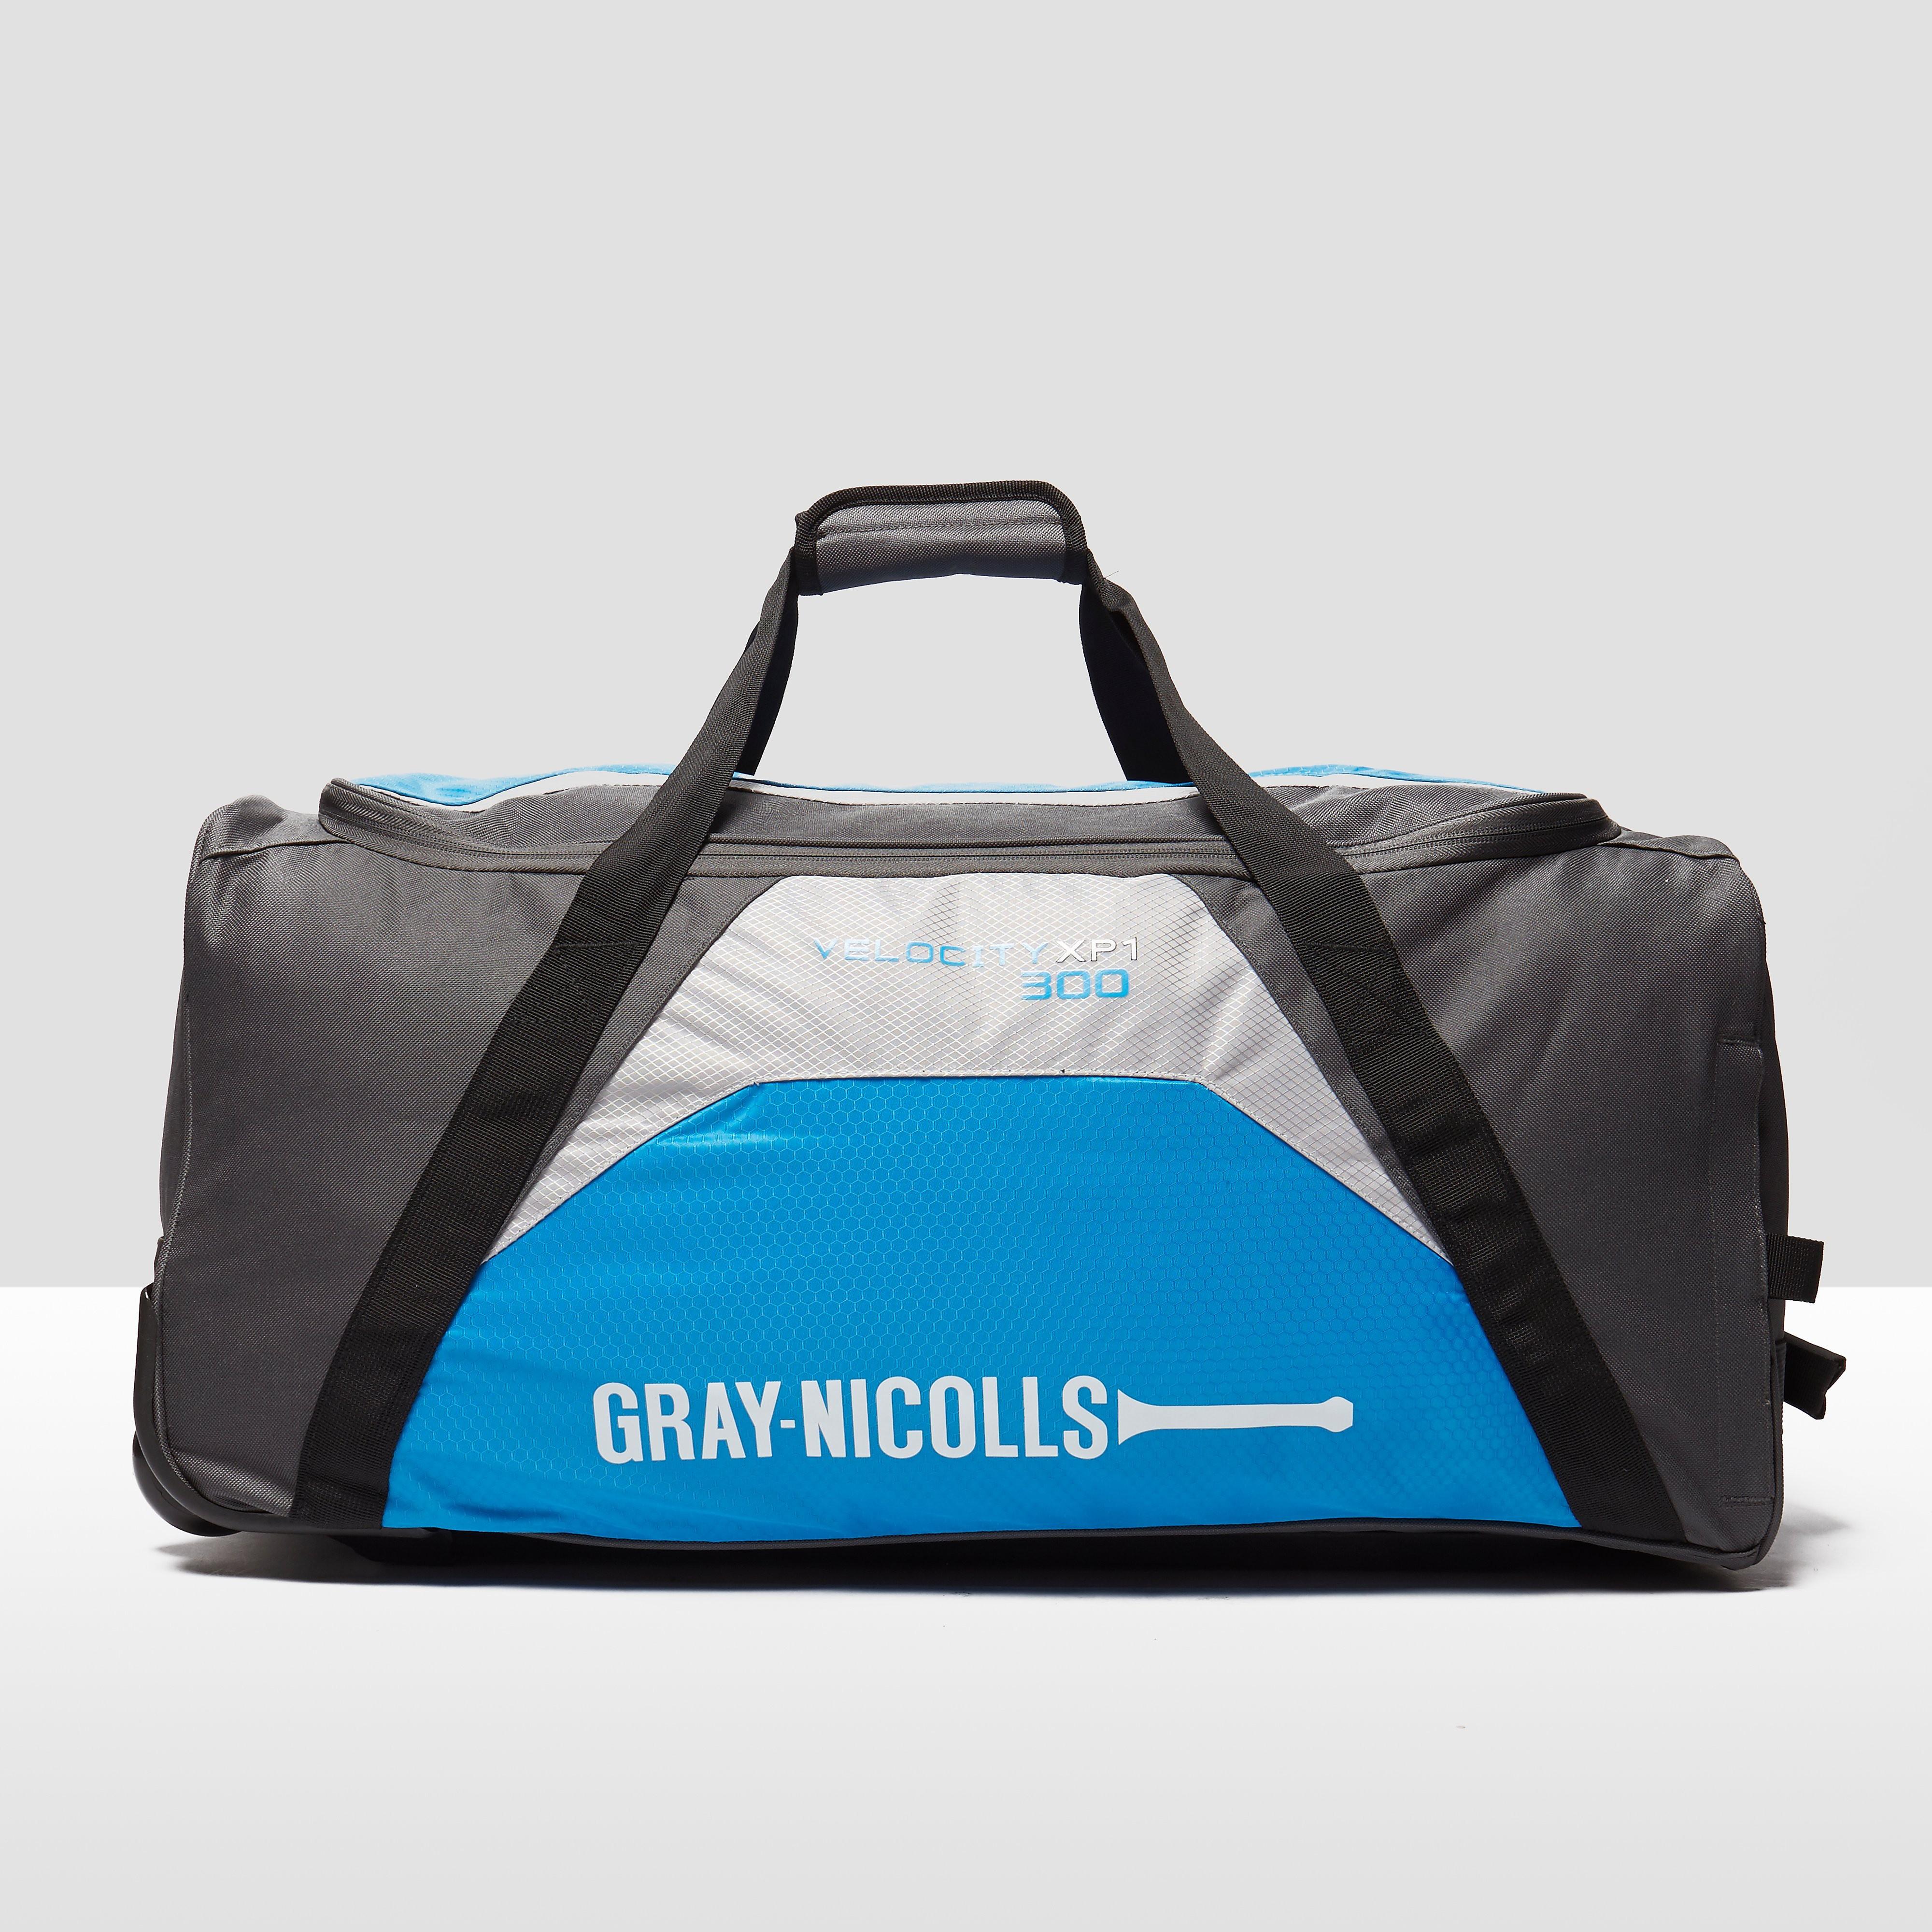 Gray Nicolls Velocity XP1 300 Holdall